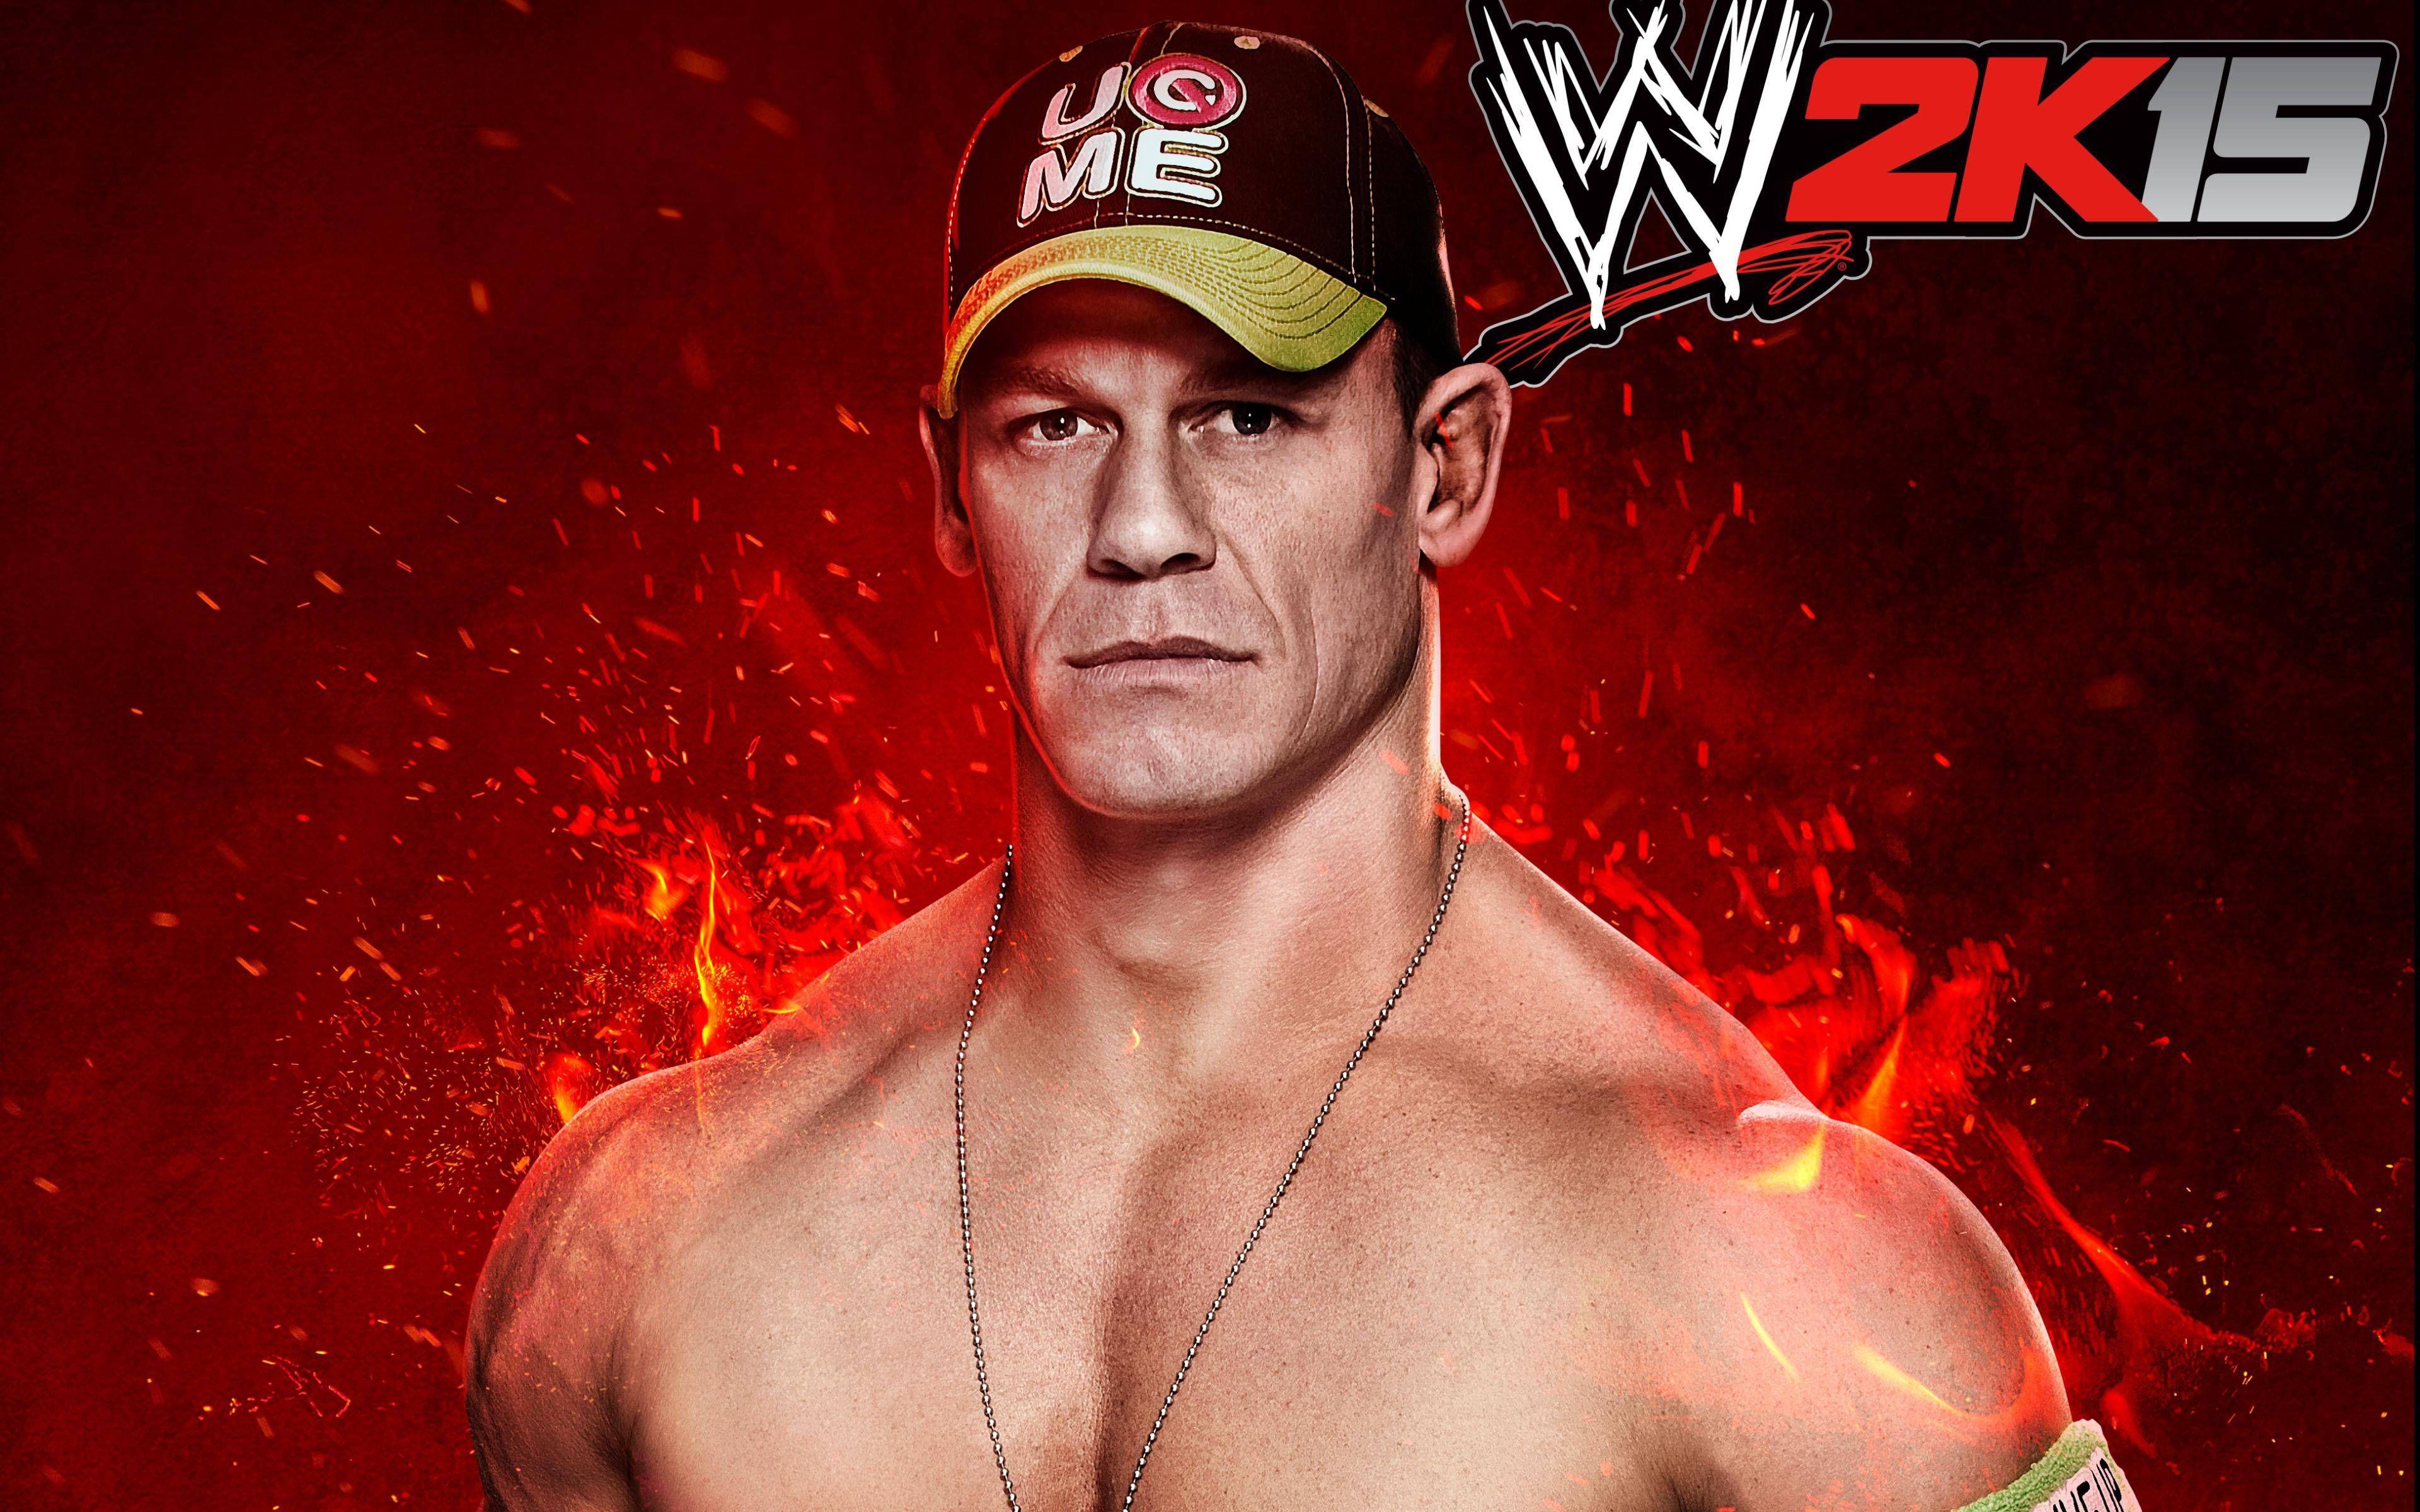 John Cena Wallpaper For Desktop Download In 4k Resolution John Cena Wwe Superstar John Cena Wwe